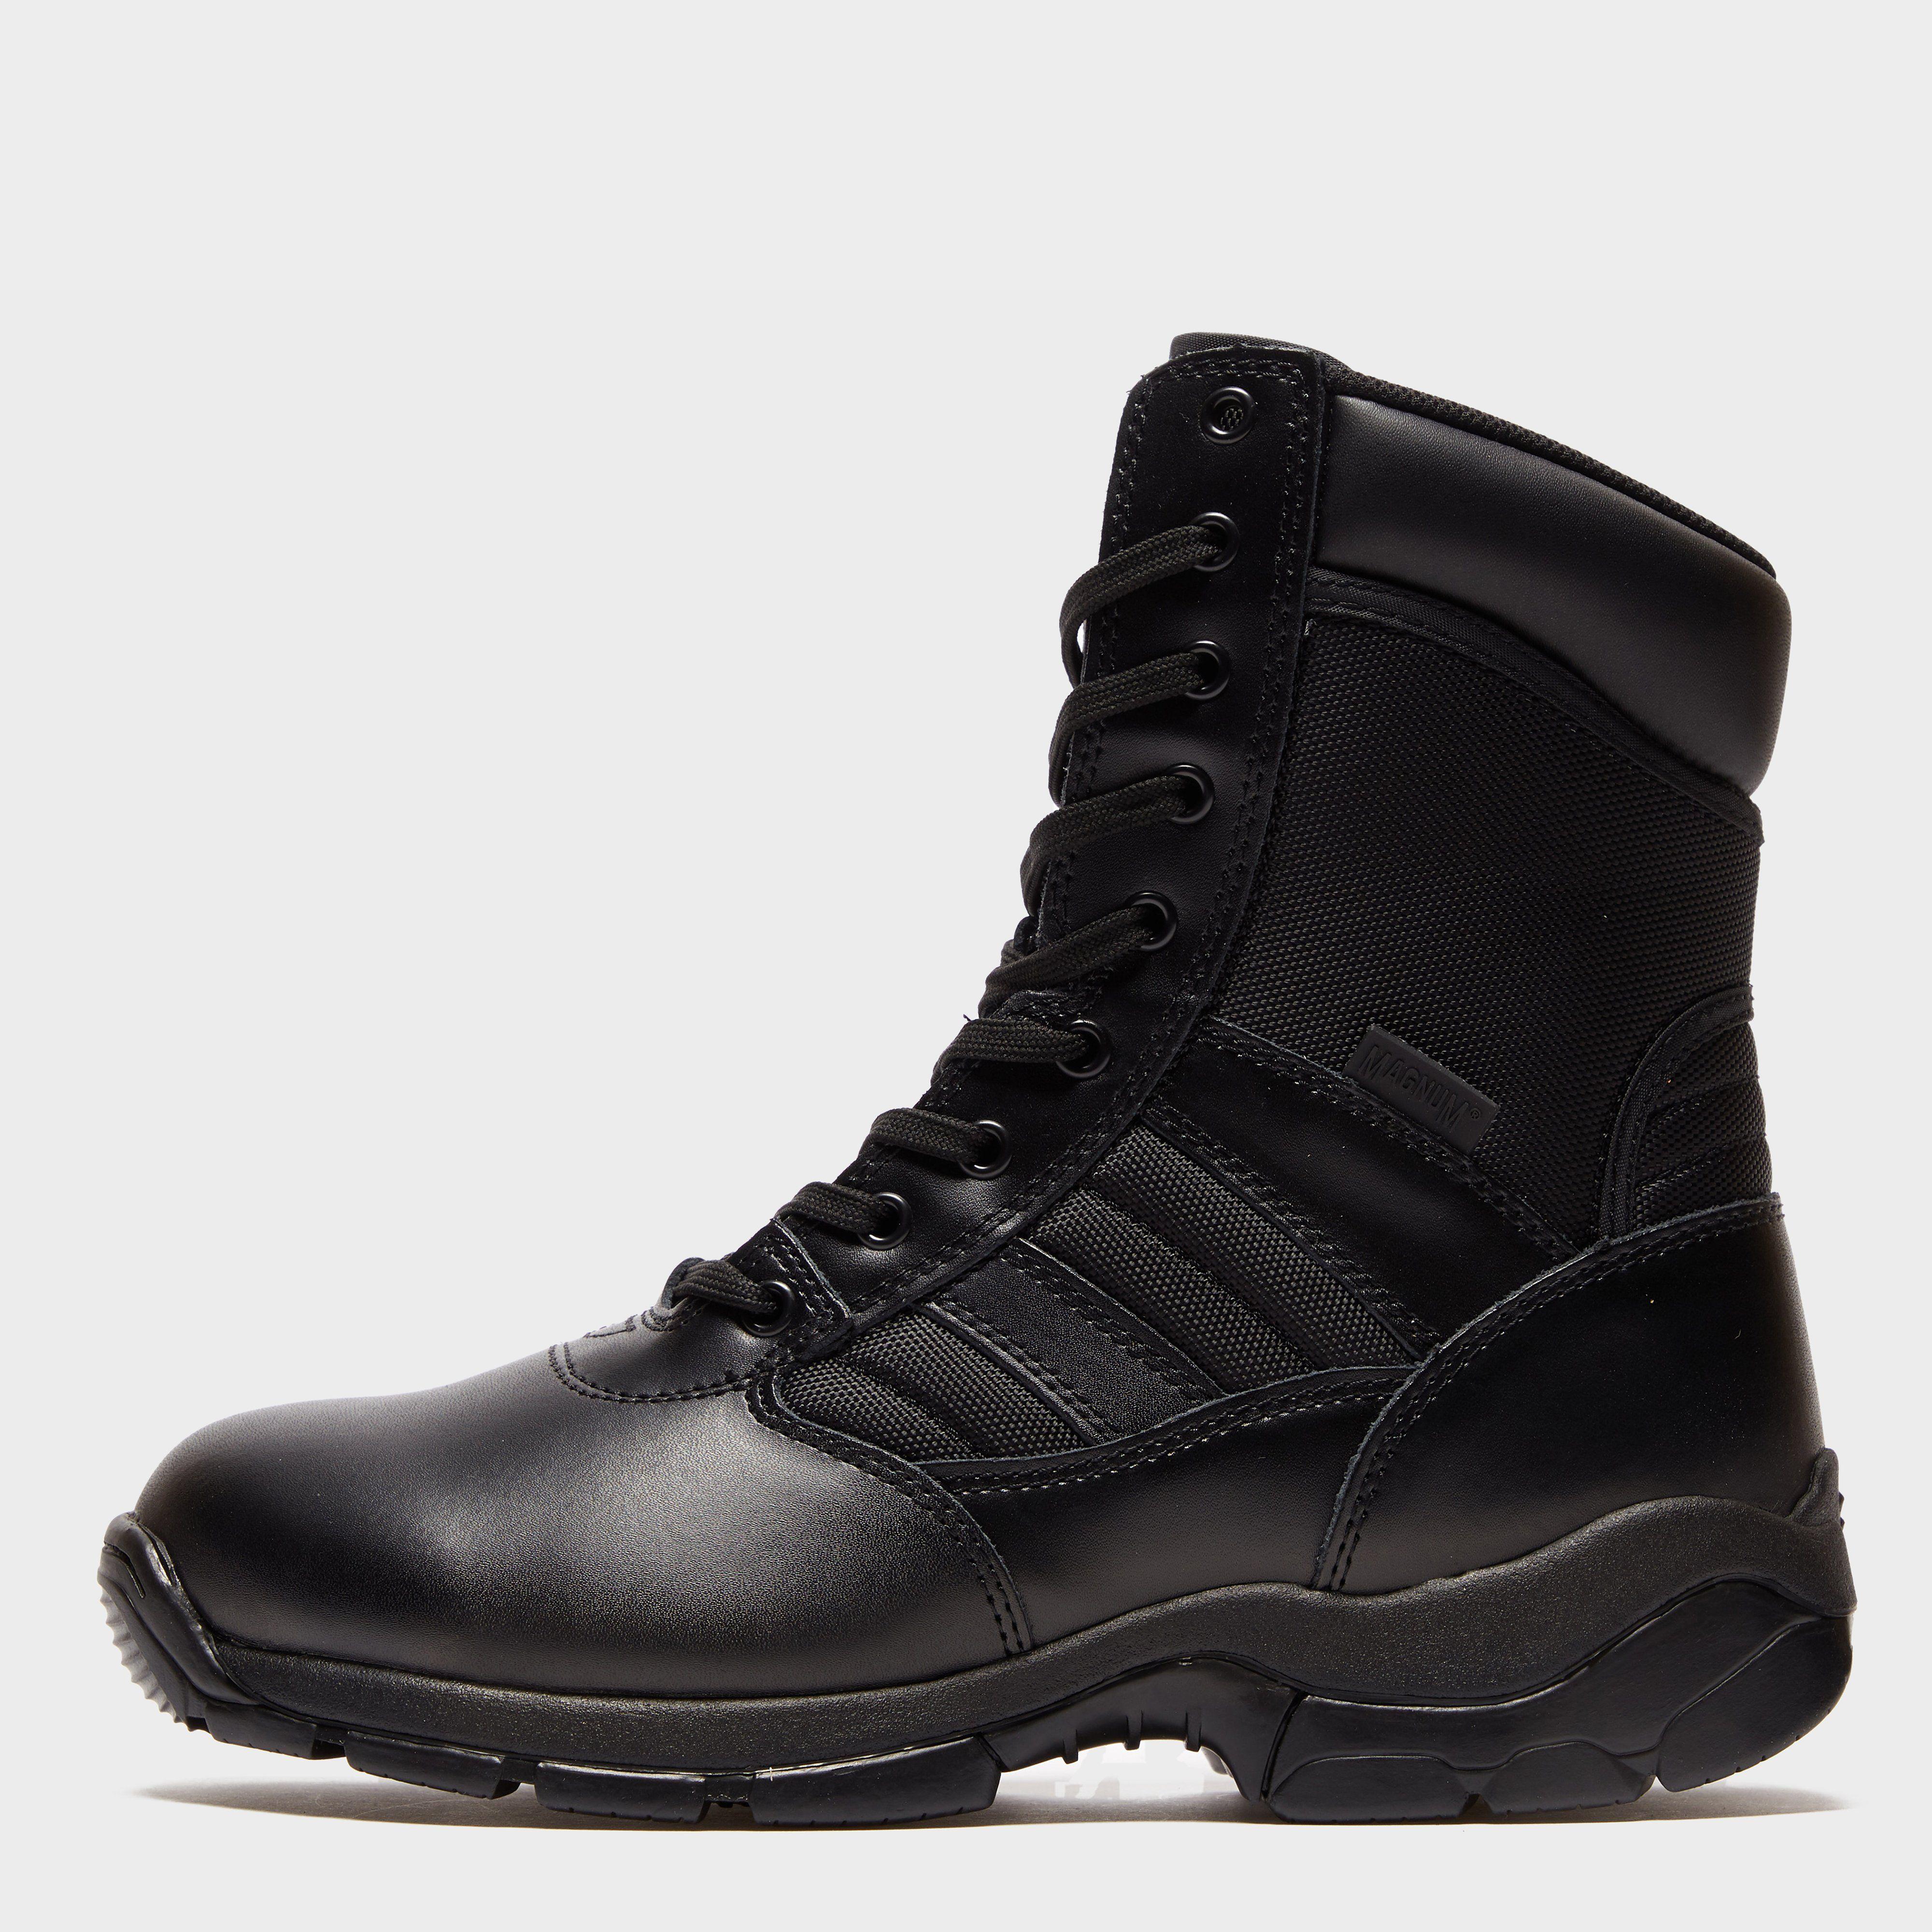 MAGNUM Men's Panther Side Zip Industrial Work Boots